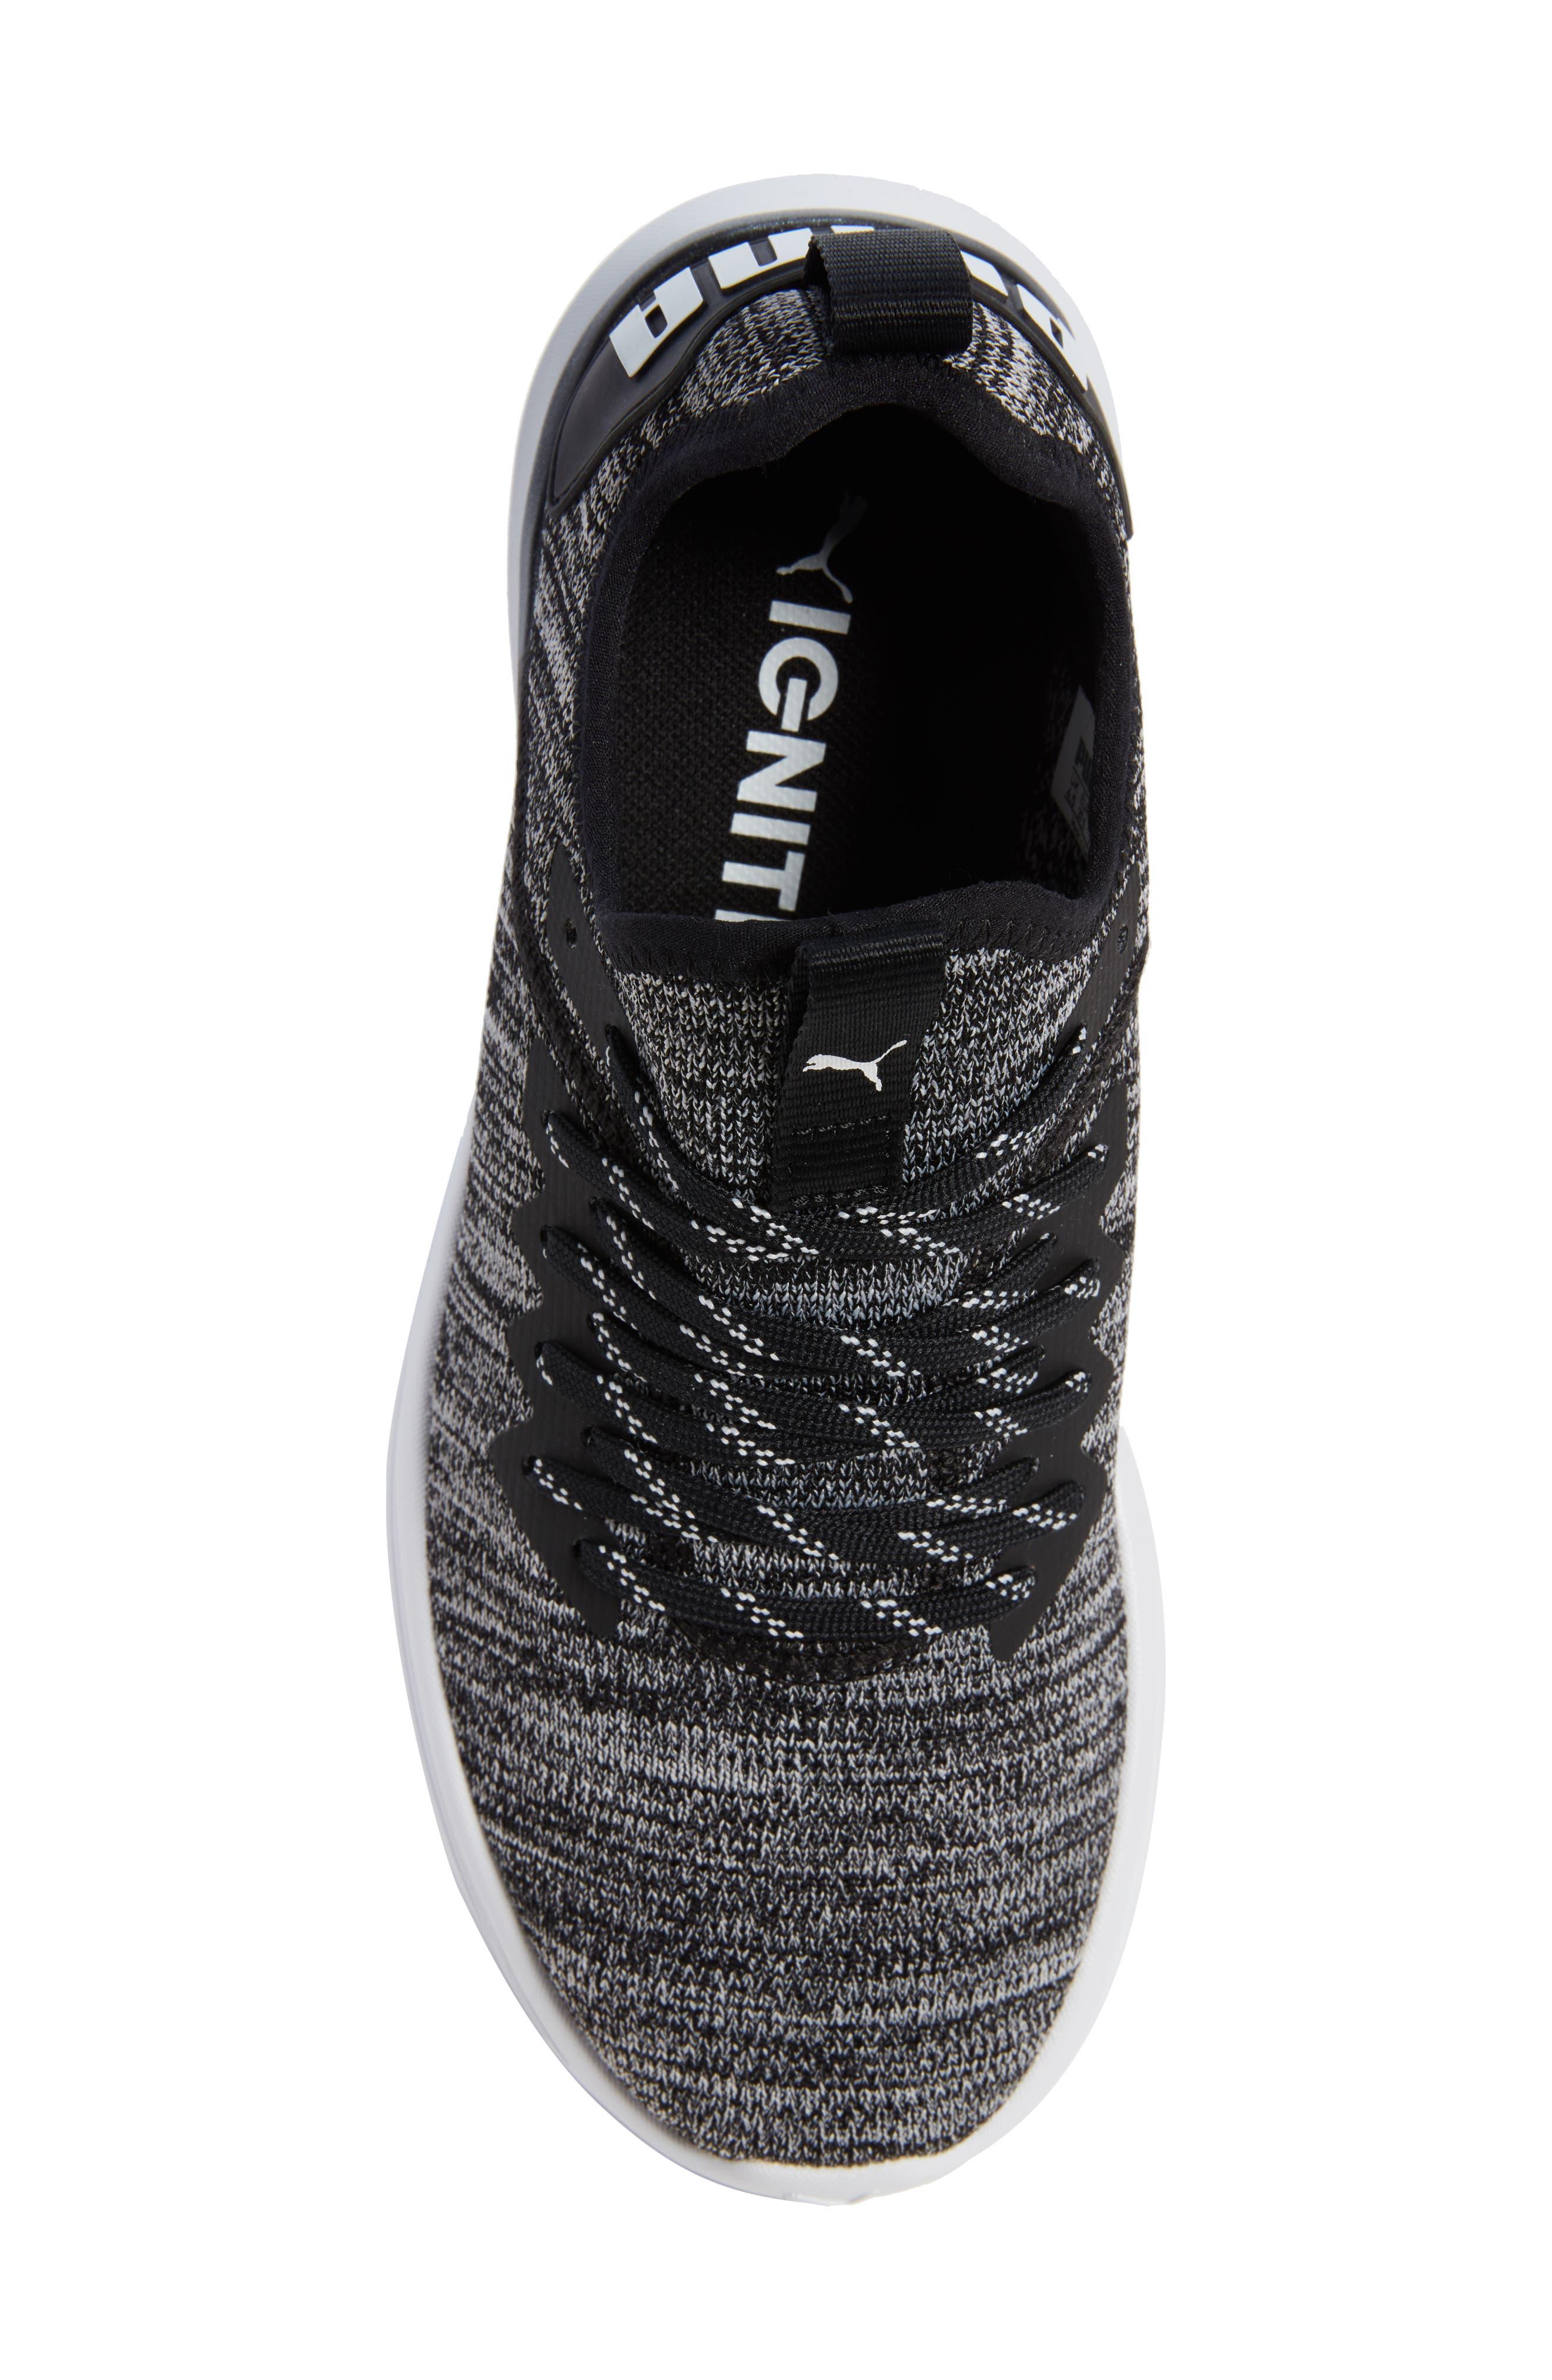 PUMA, IGNITE Flash evoKNIT Training Shoe, Alternate thumbnail 5, color, 001